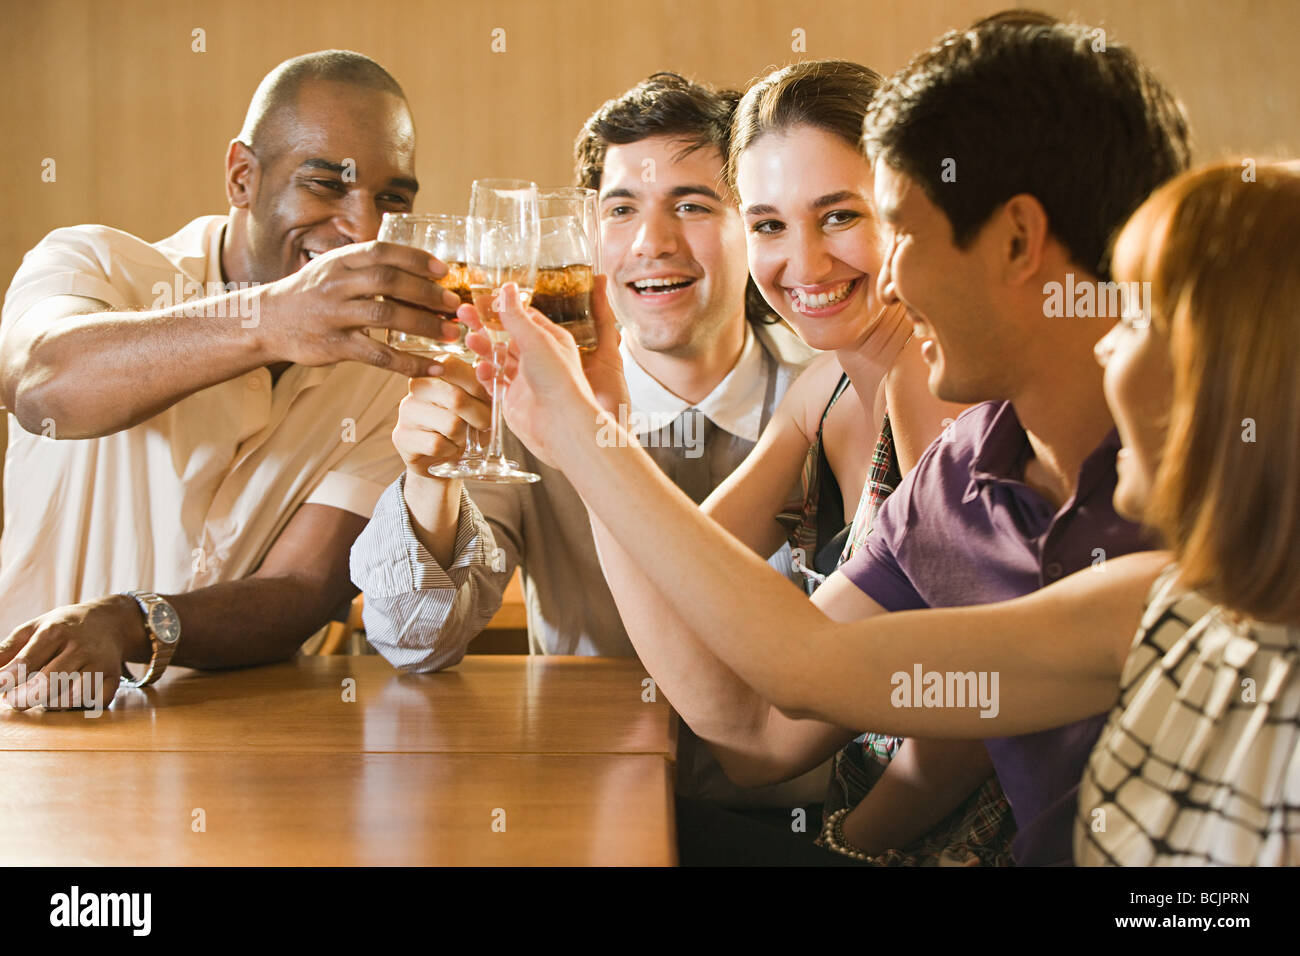 Amigos celebrando en un bar. Imagen De Stock